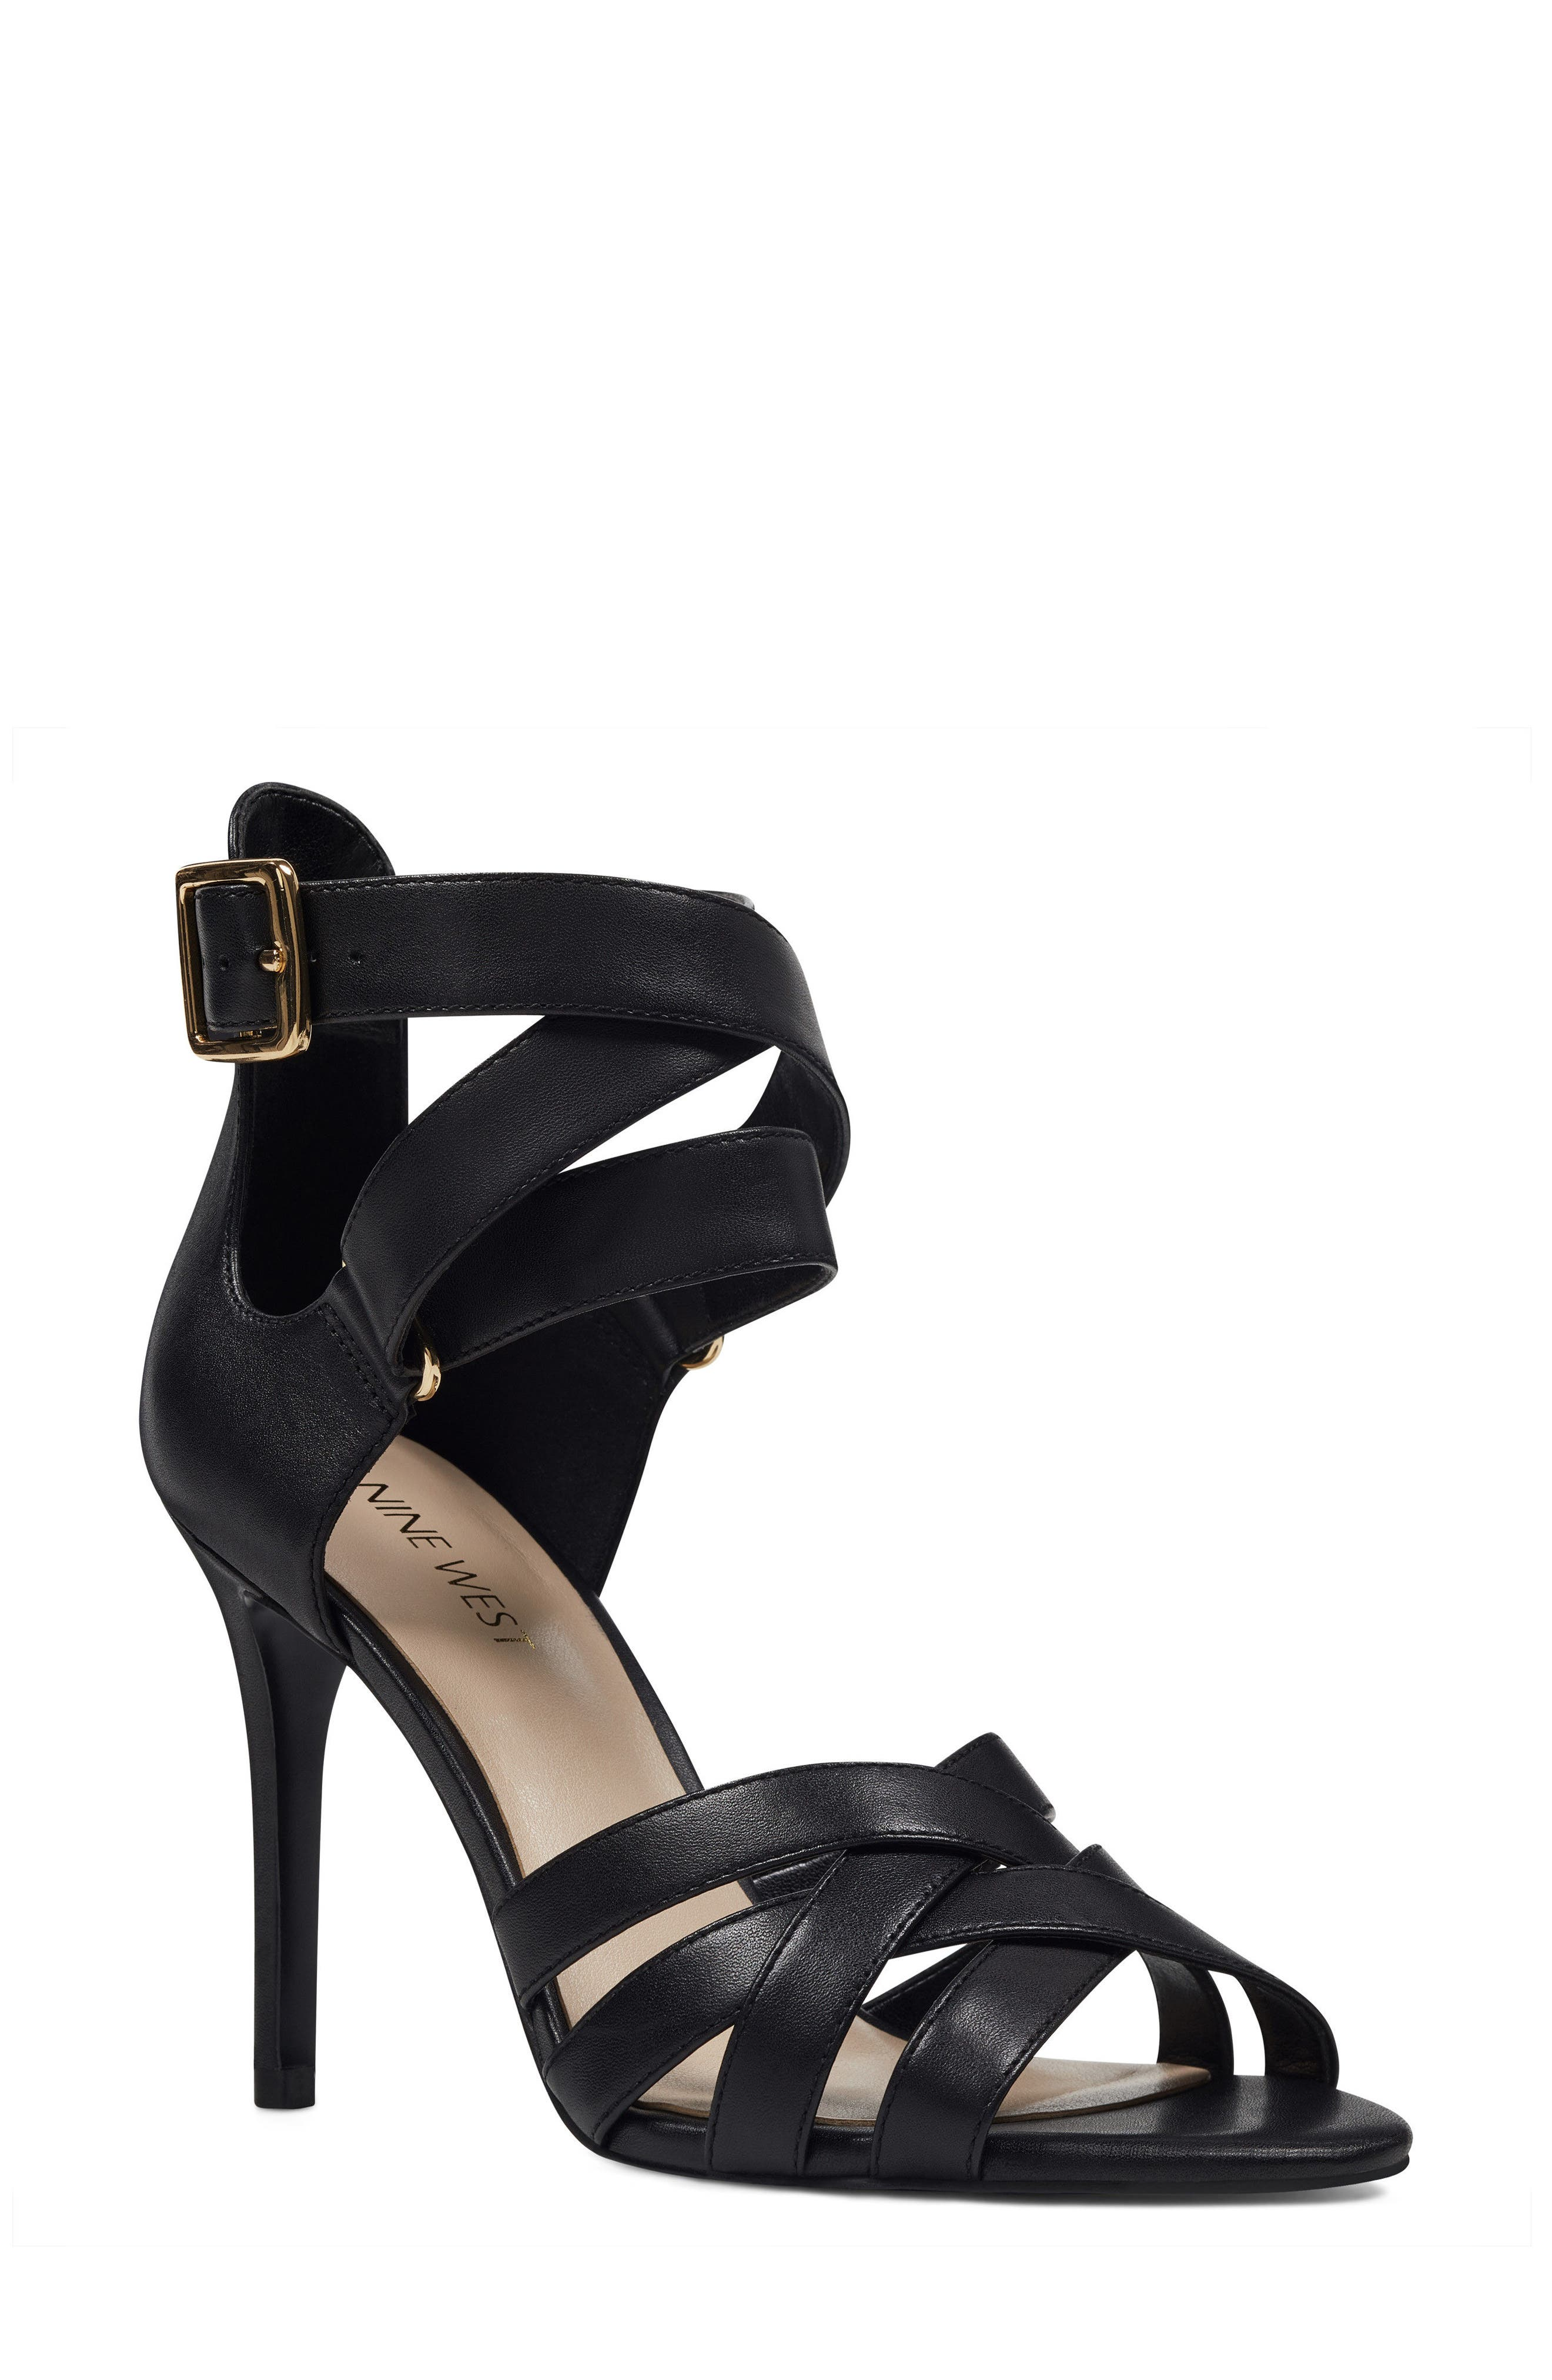 McGlynn Strappy Sandal,                             Main thumbnail 1, color,                             Black Leather